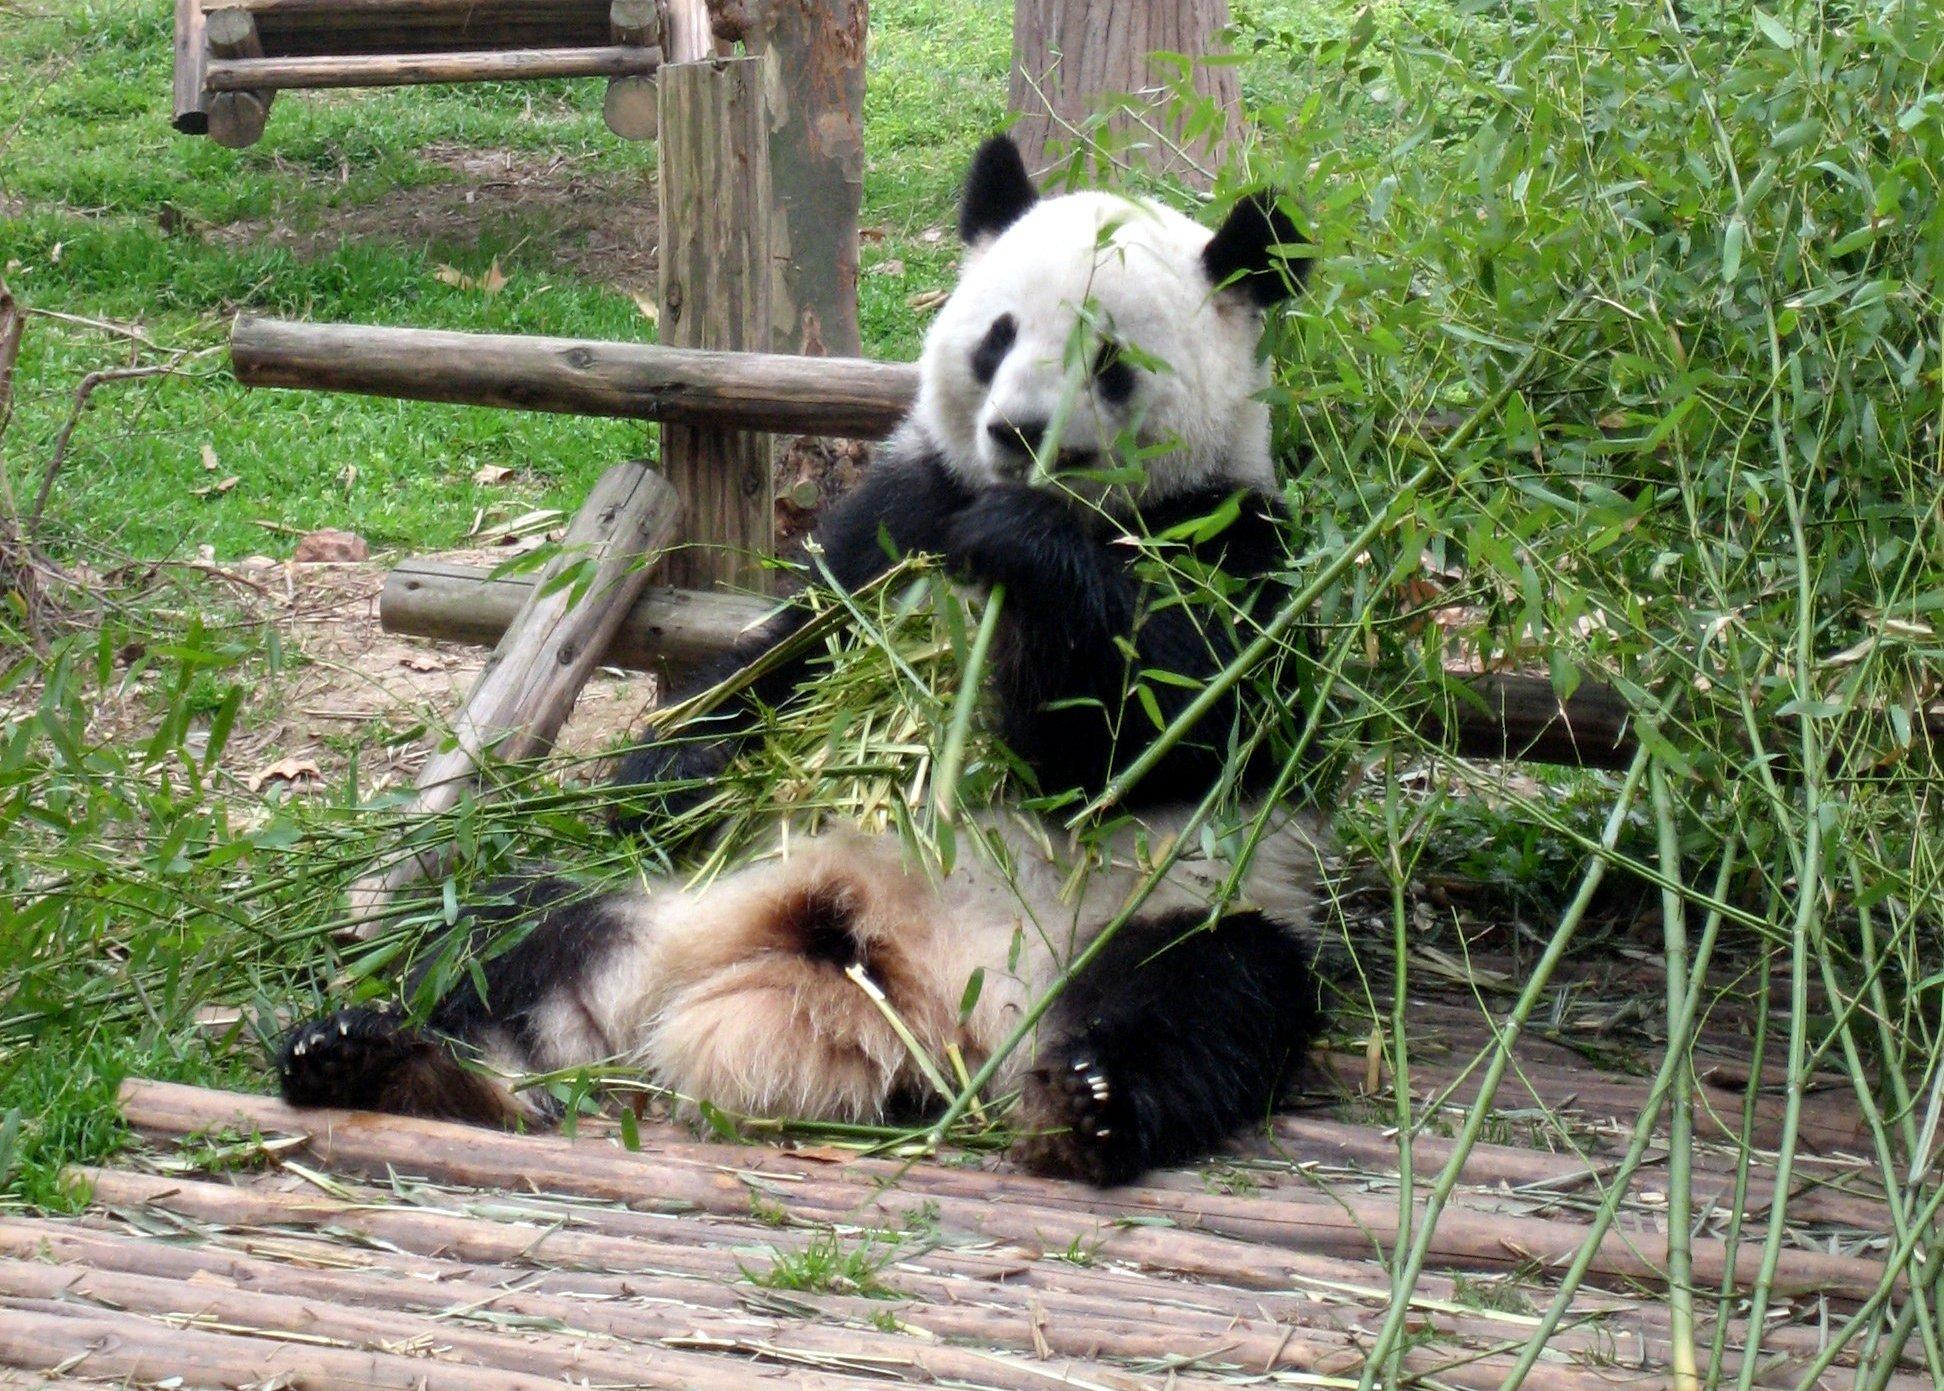 Visit Pandas in China, CTS Horiozns